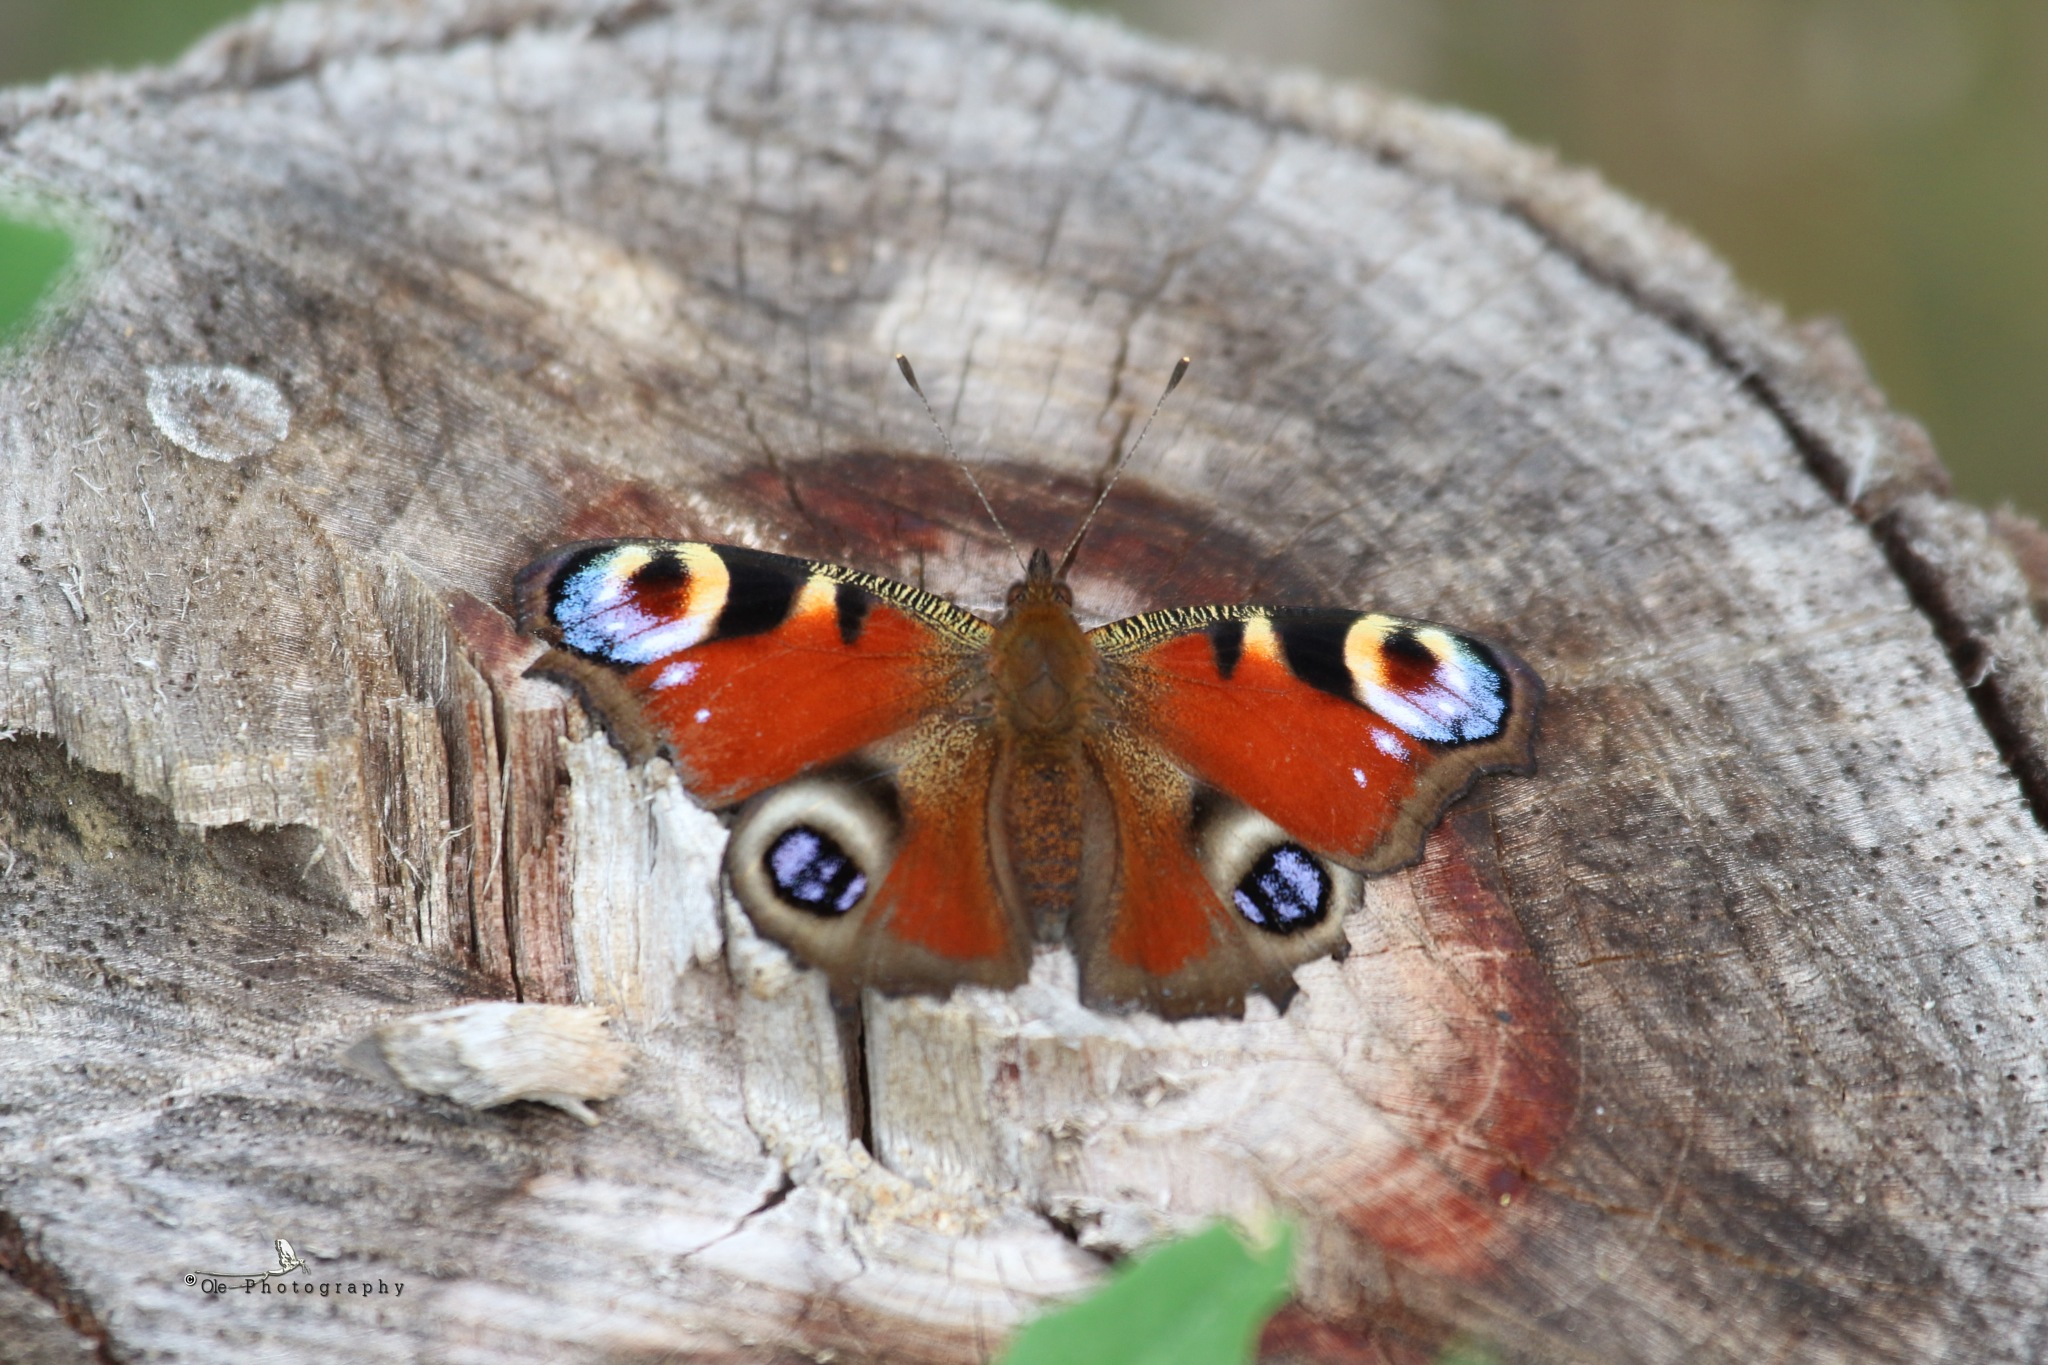 European Peacock Butterfly (Aglais io) by OlePhotography